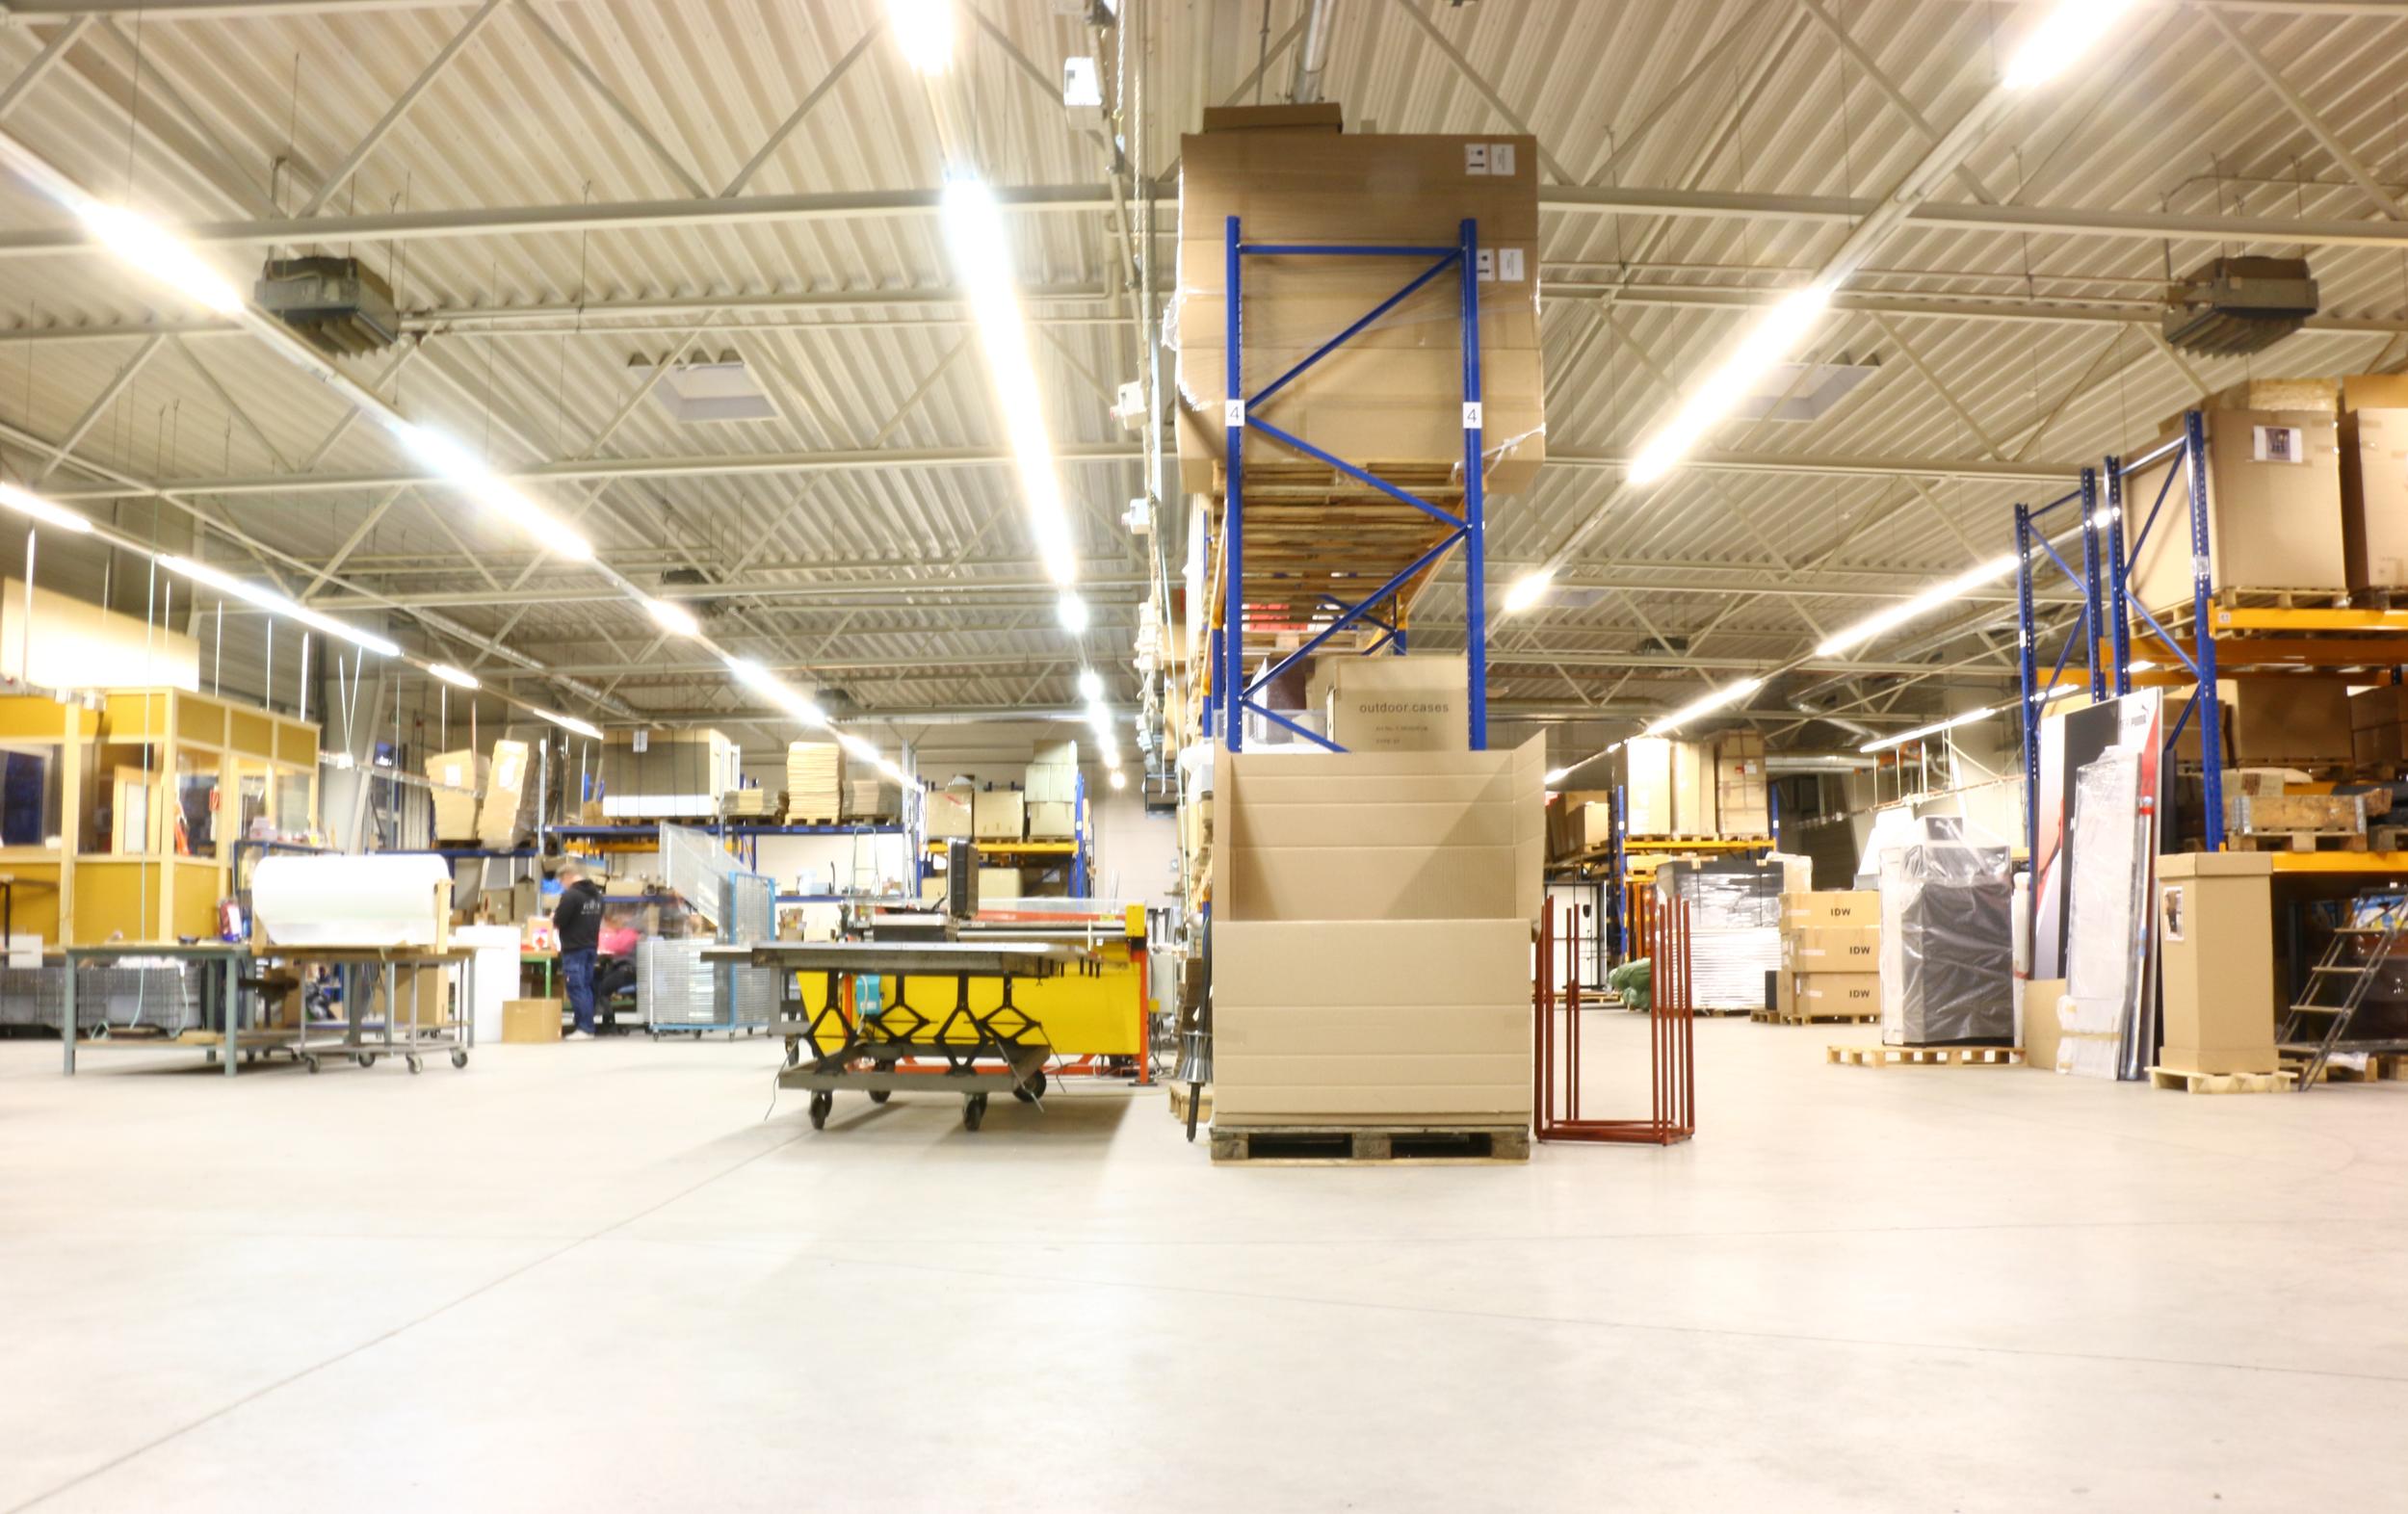 STORAGE - Handling of logistics, transport, & storage